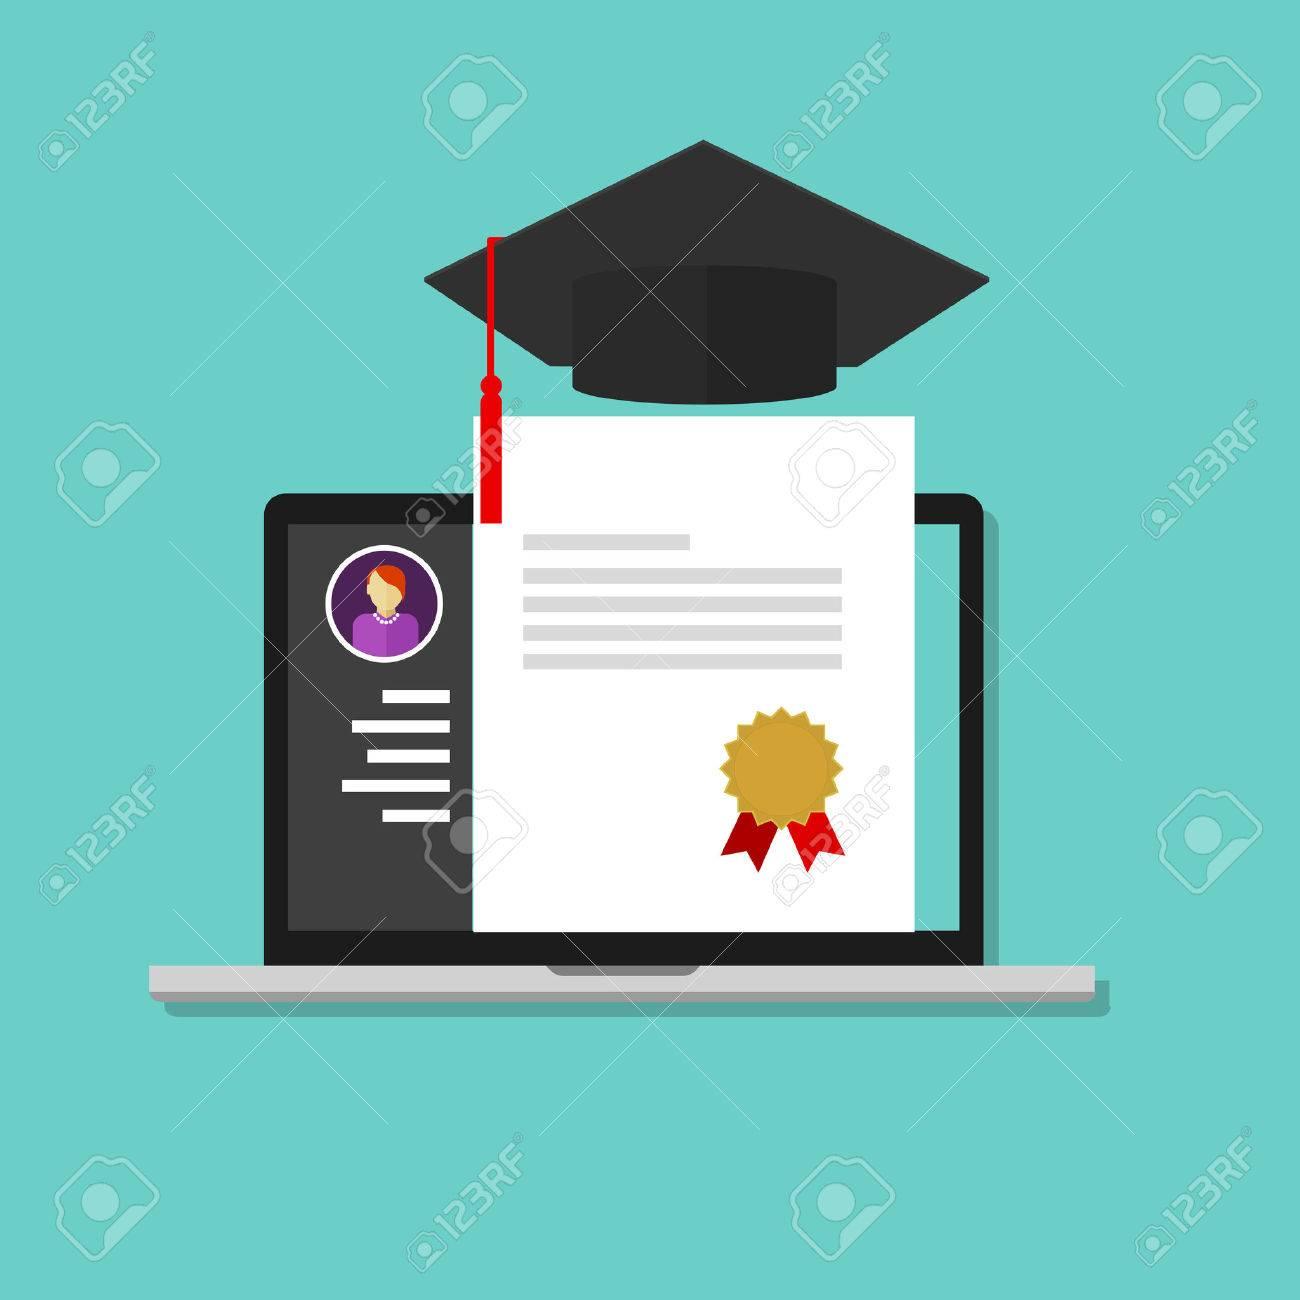 Online Degree Laptop Education College School Graduate Certificate ...